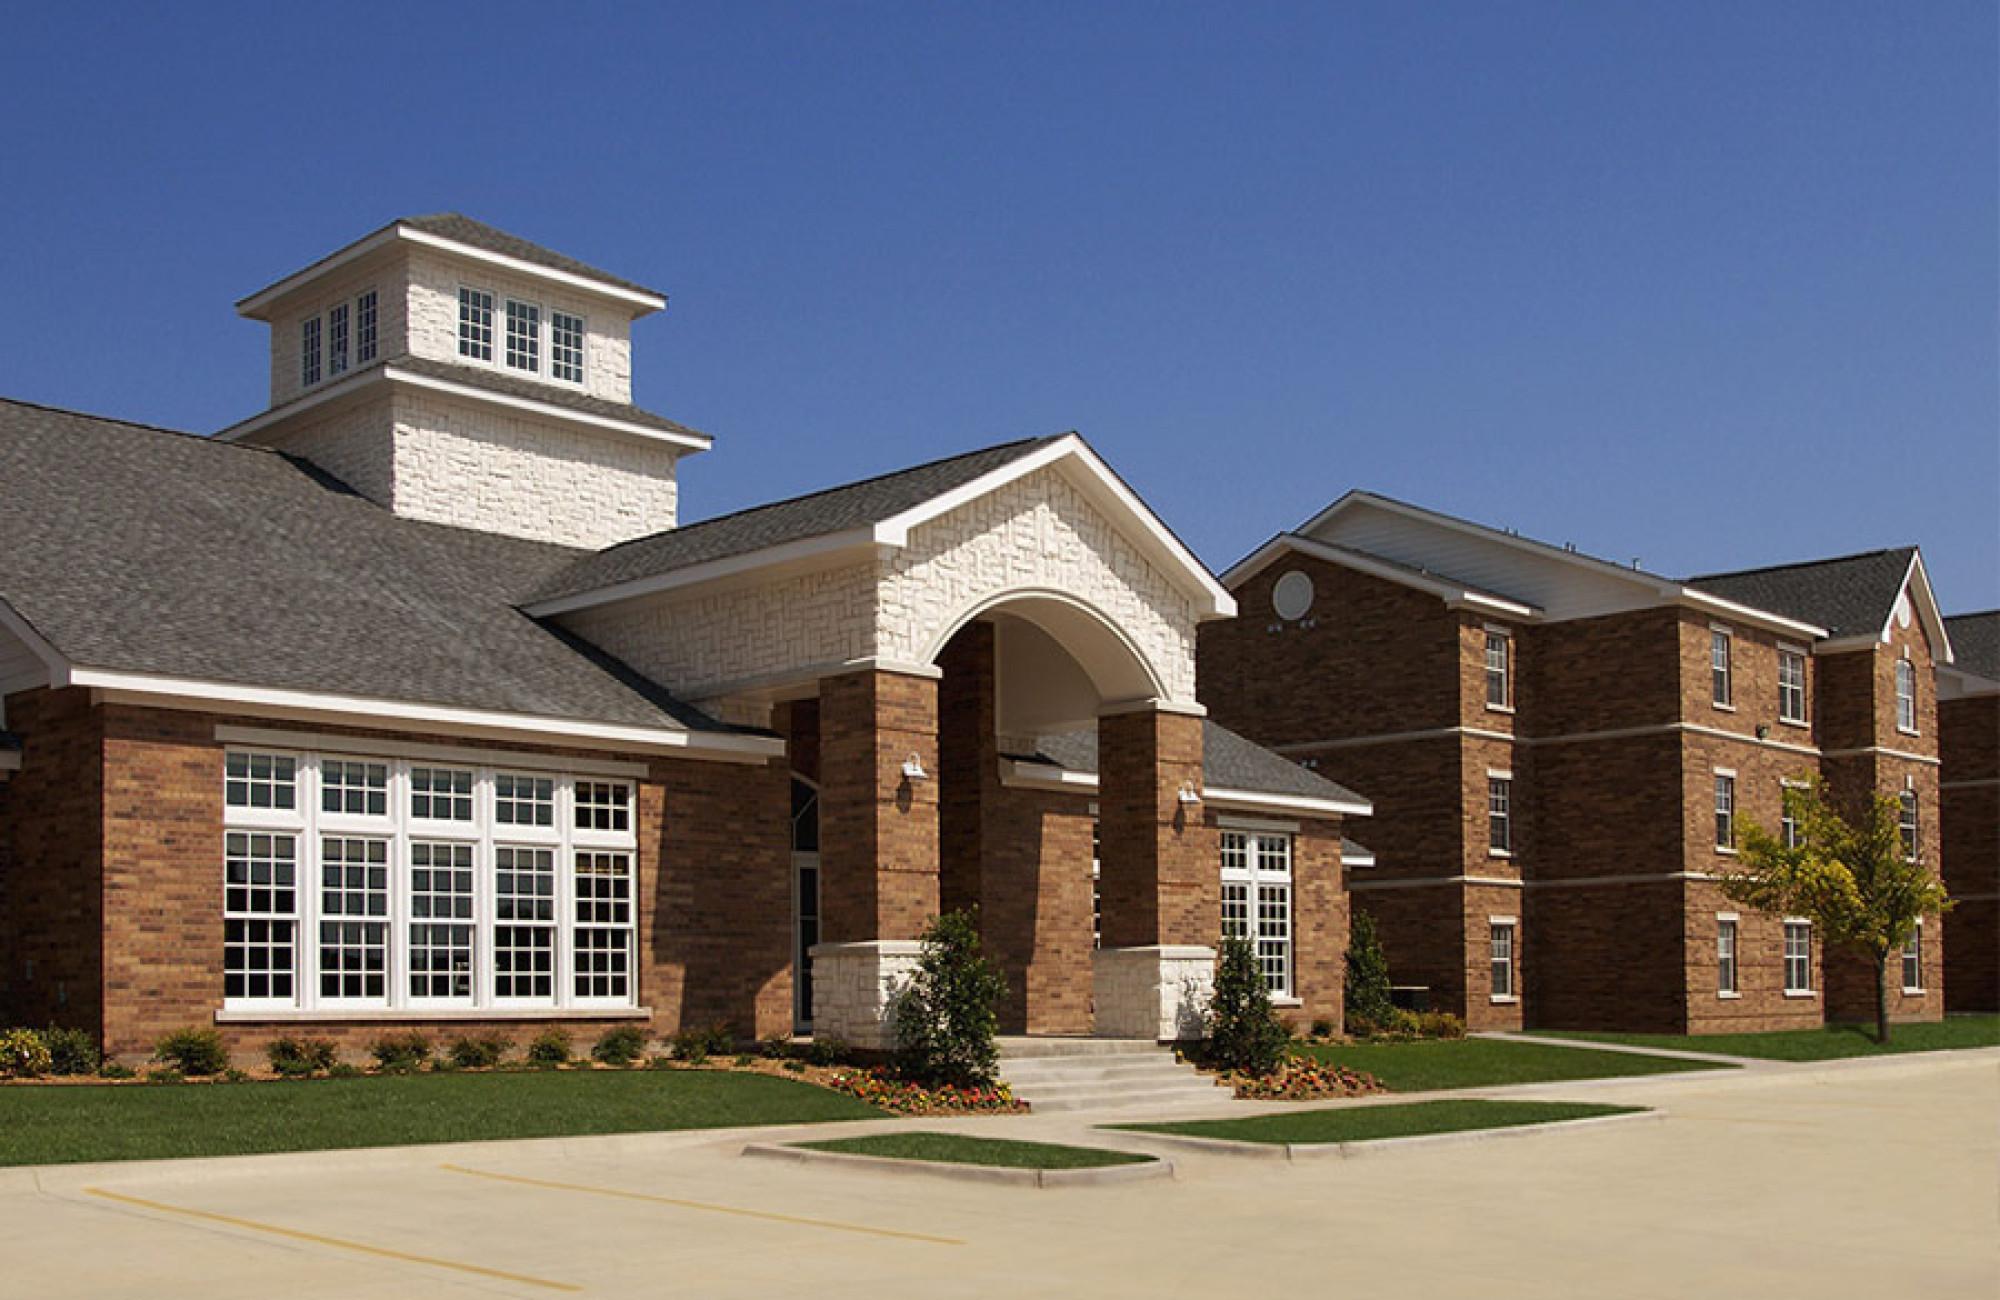 Wichita Falls Tx 76309 Apartments Near Midwestern State University Apartment Decorating